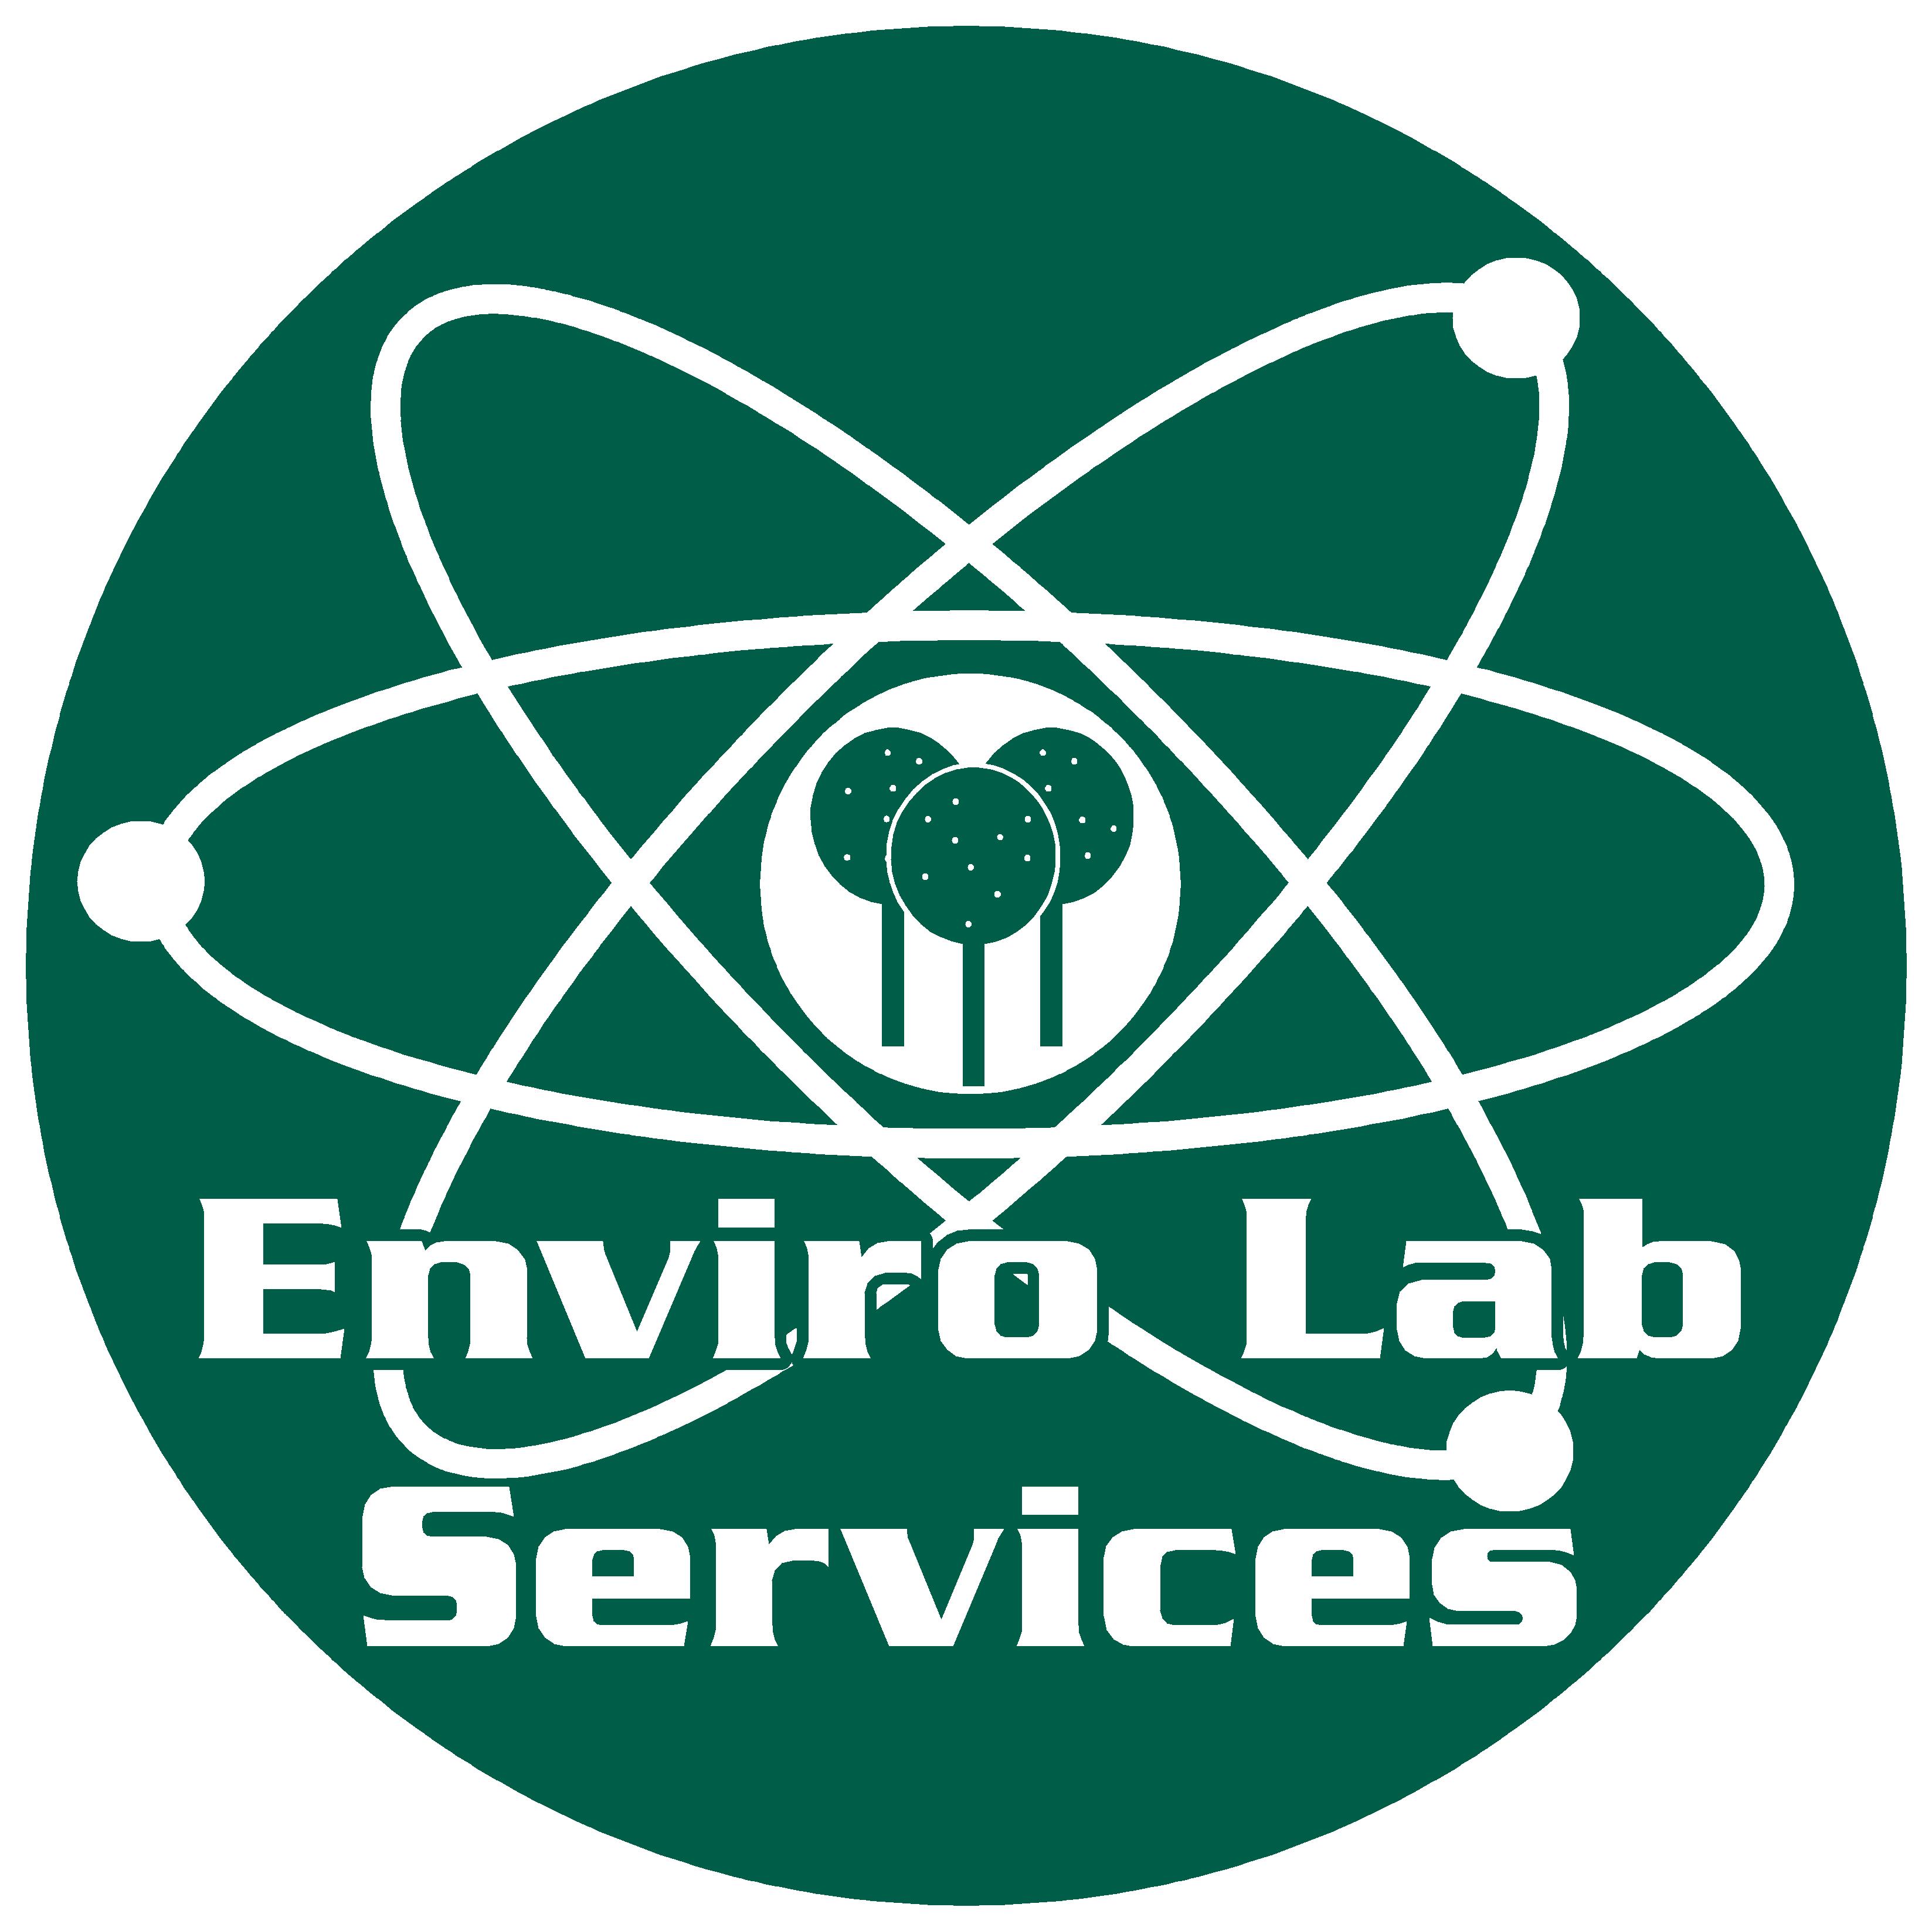 Enviro Lab Services